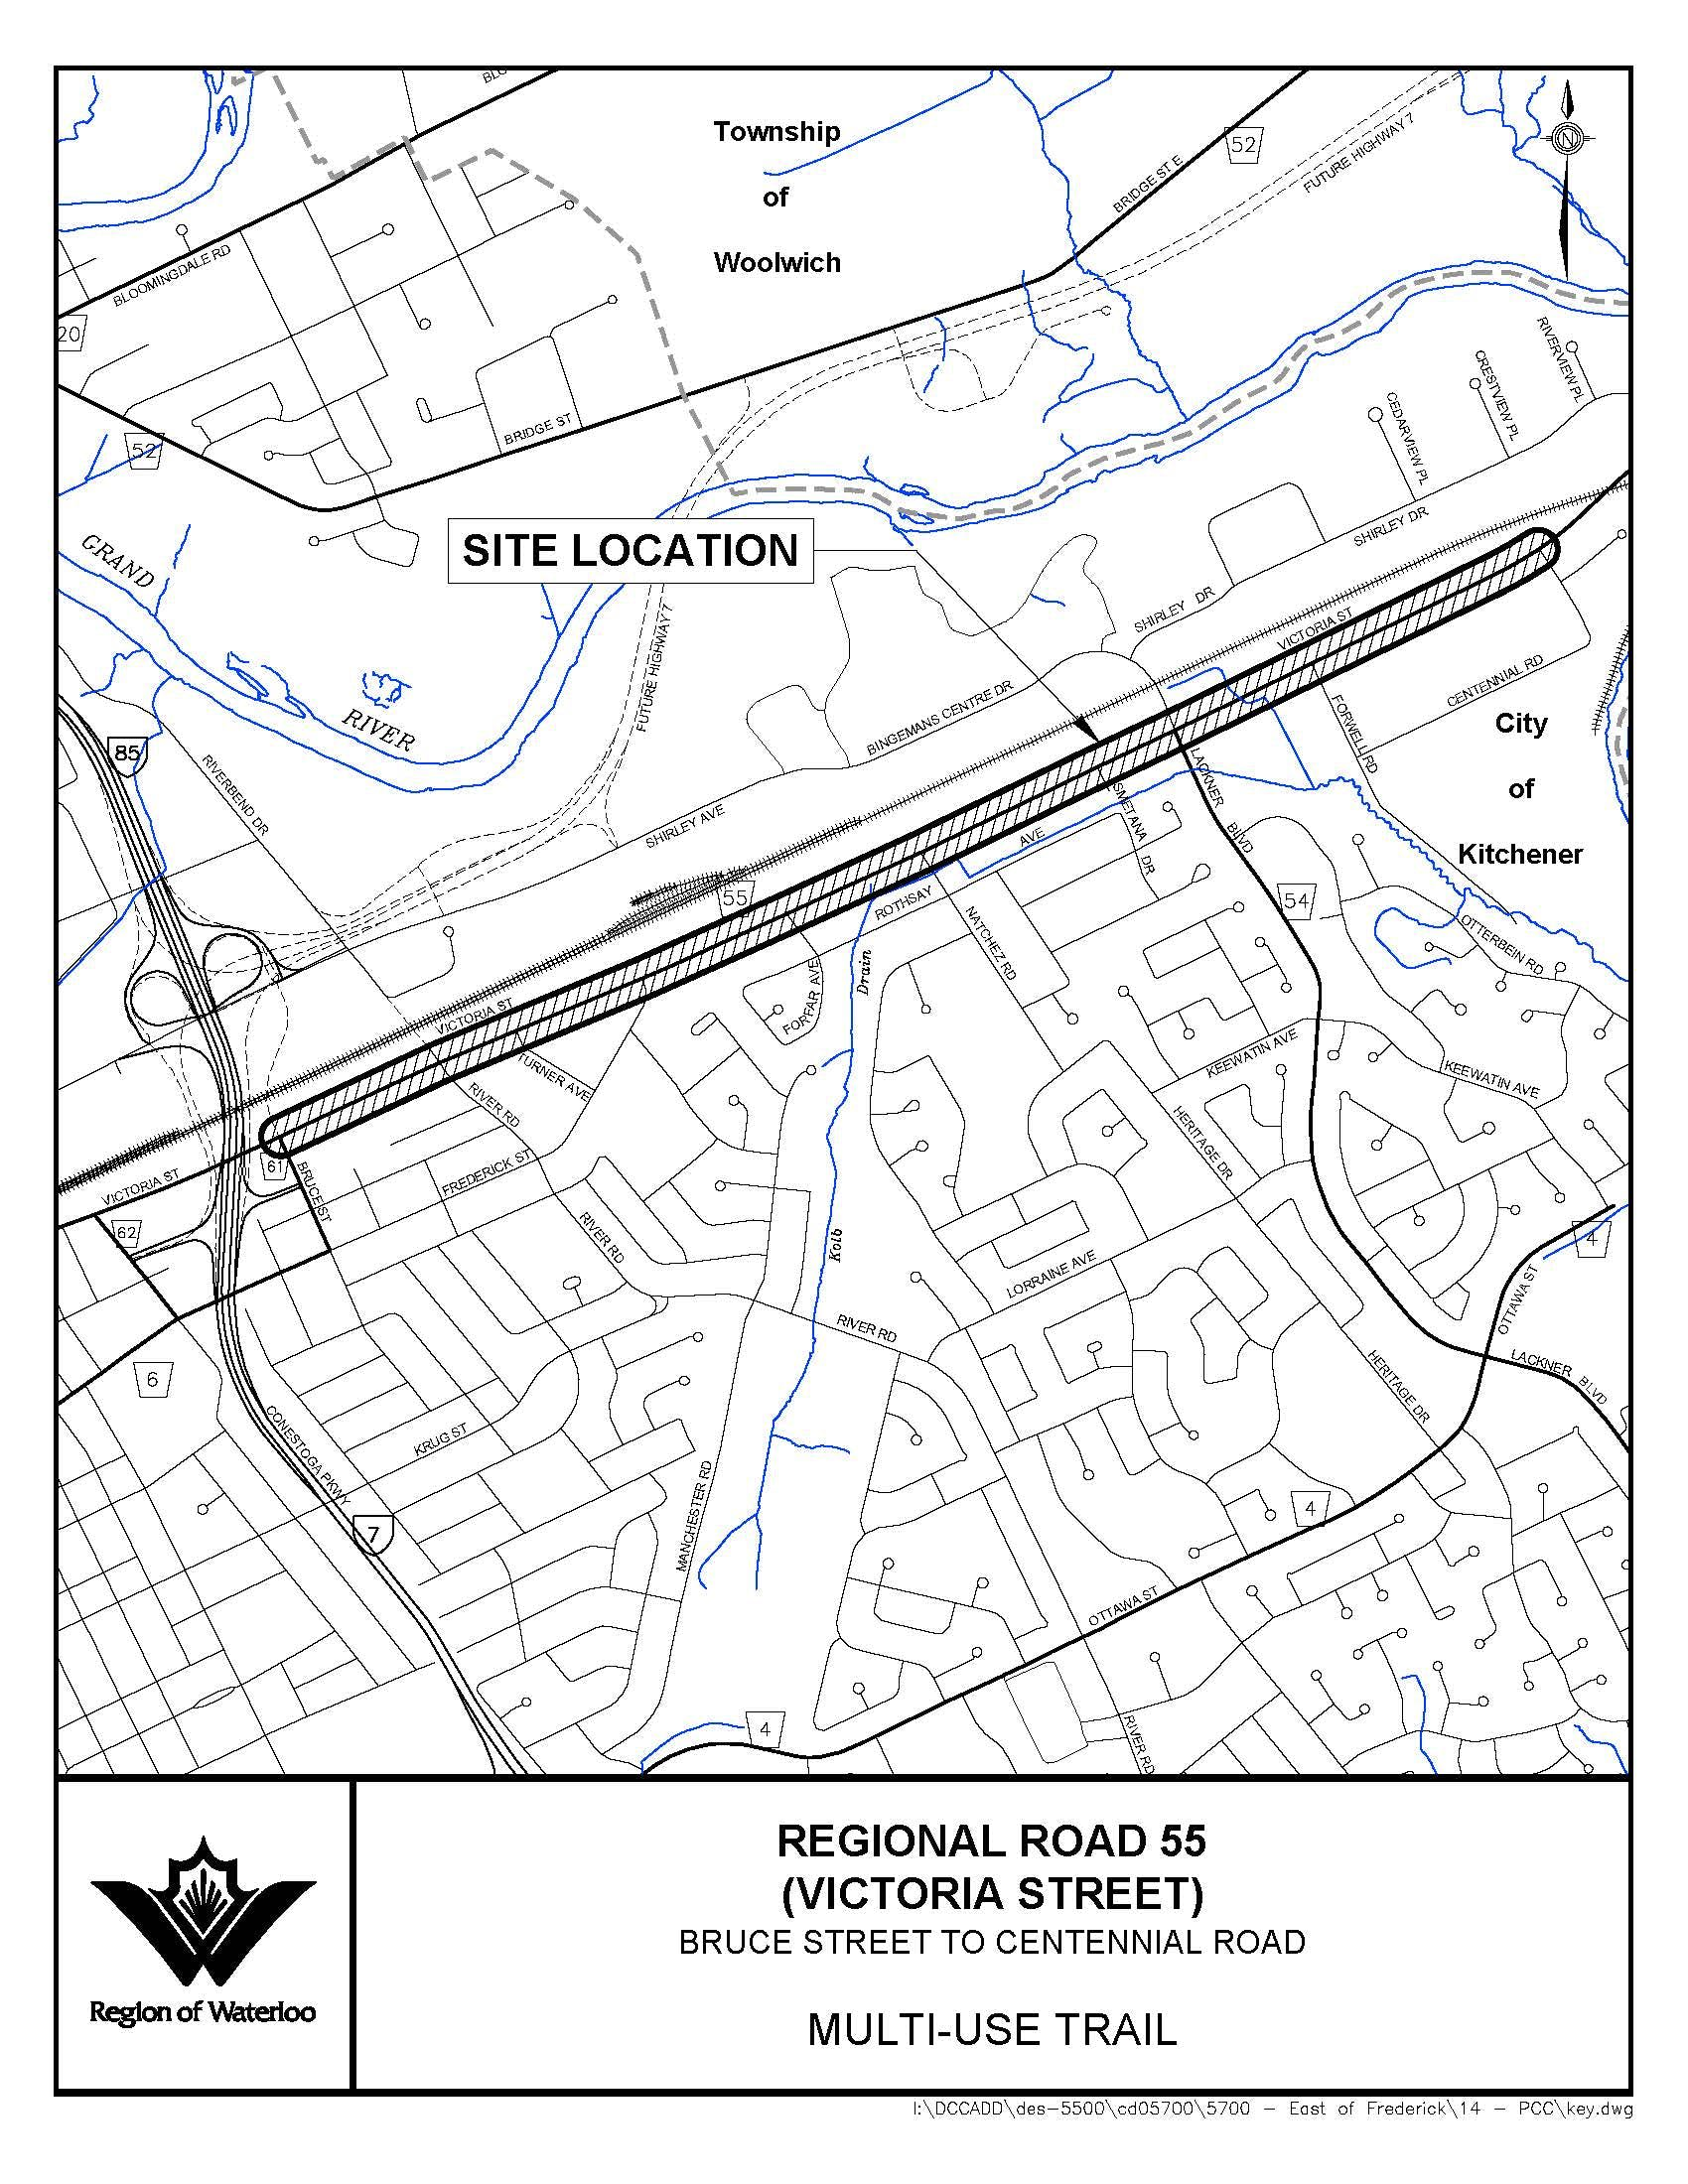 Victoria Street Key Plan